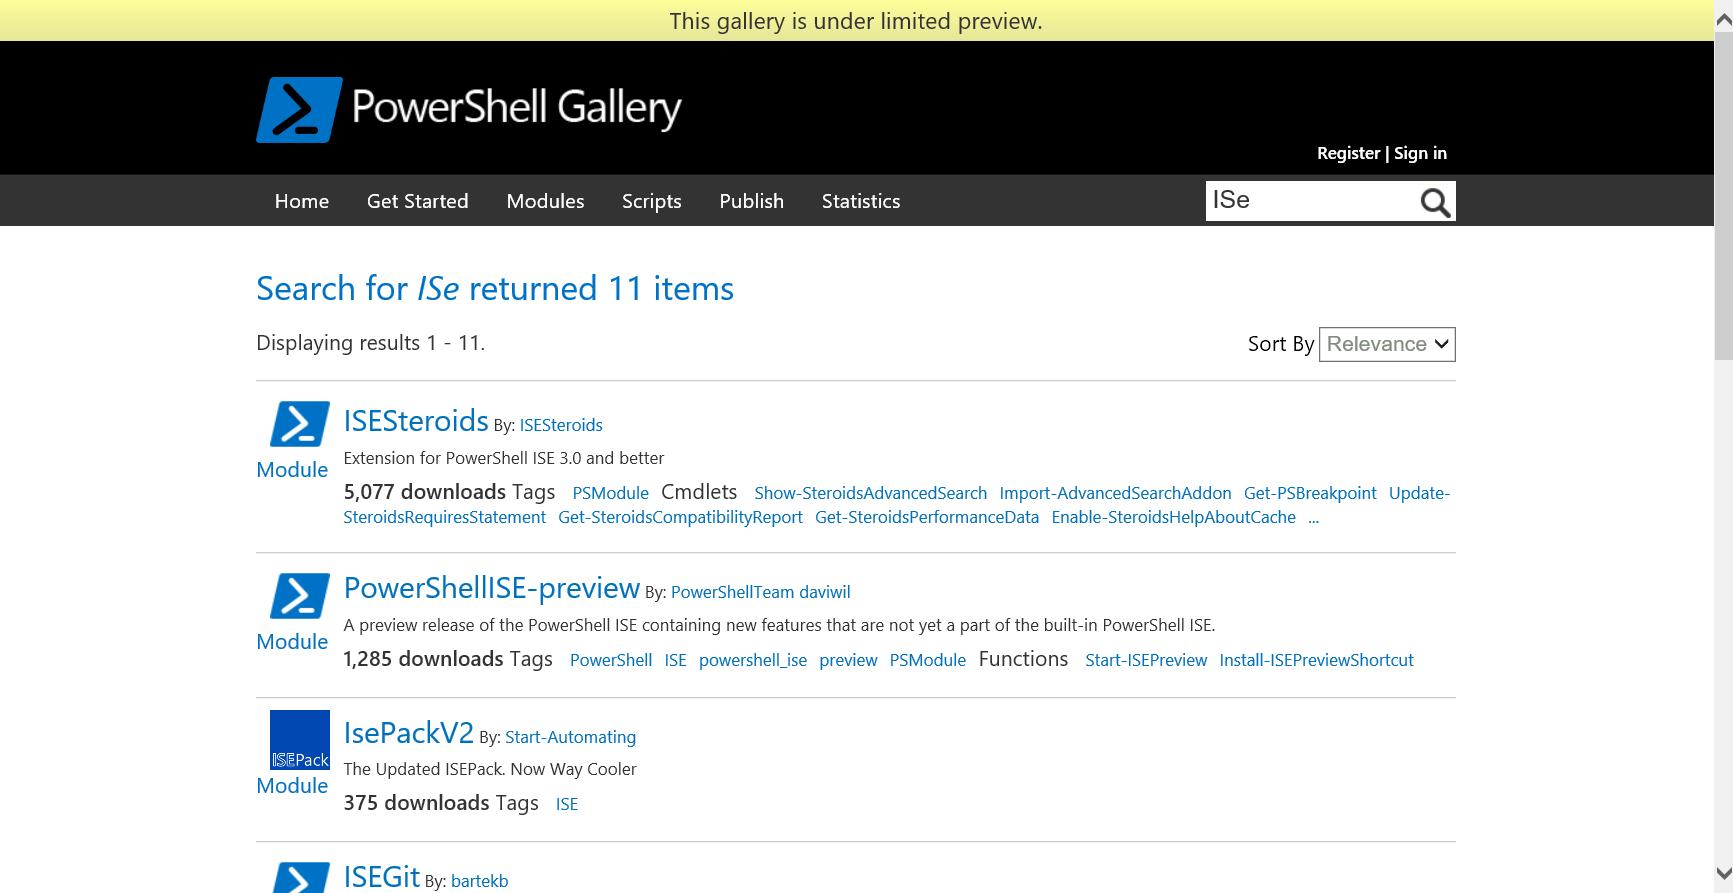 PowerShell Gallery